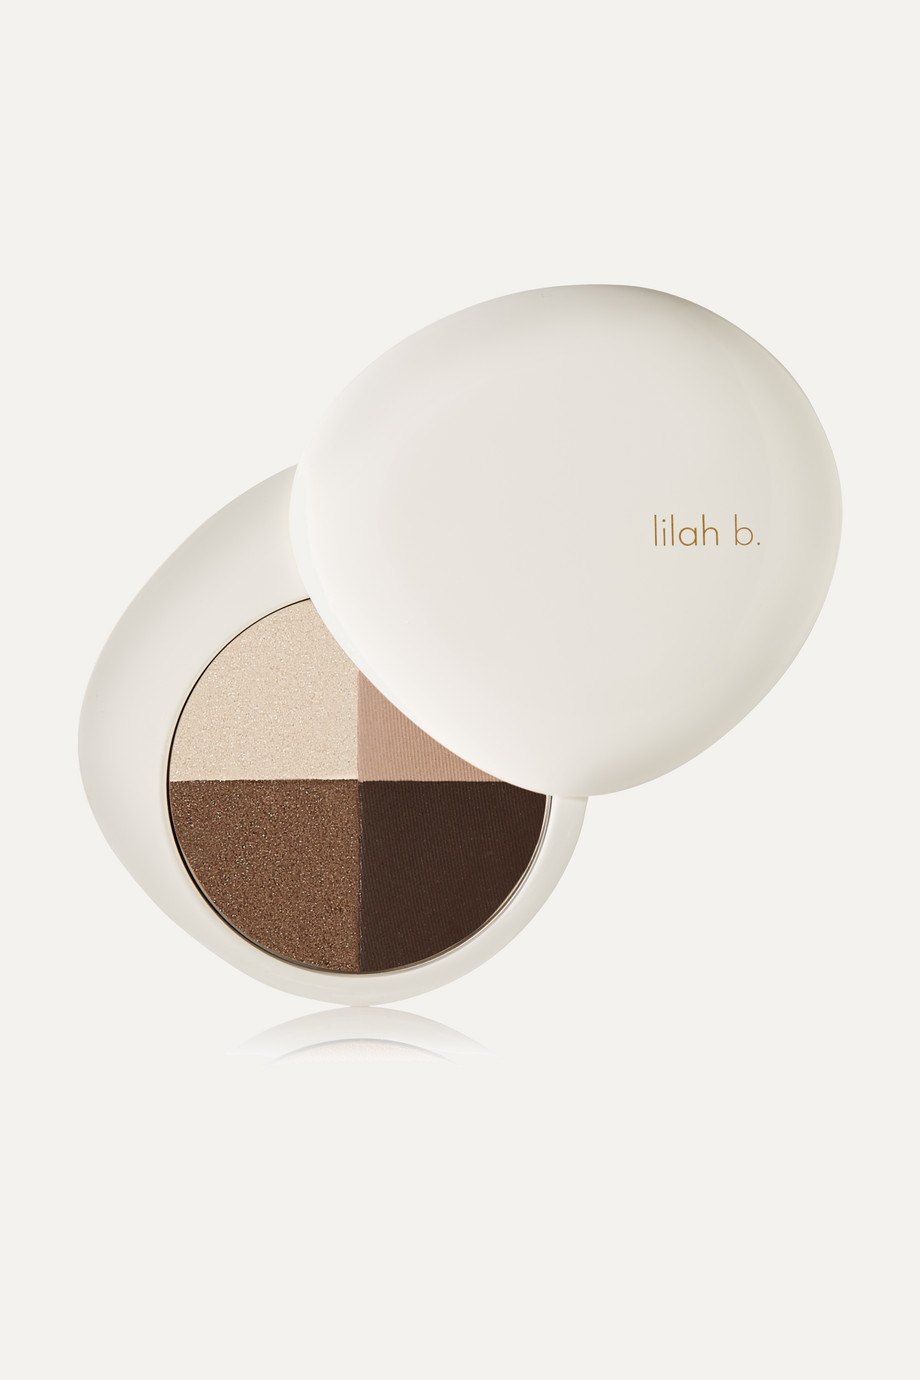 Lilah B. Palette Perfection Eye Quad - b.stunning